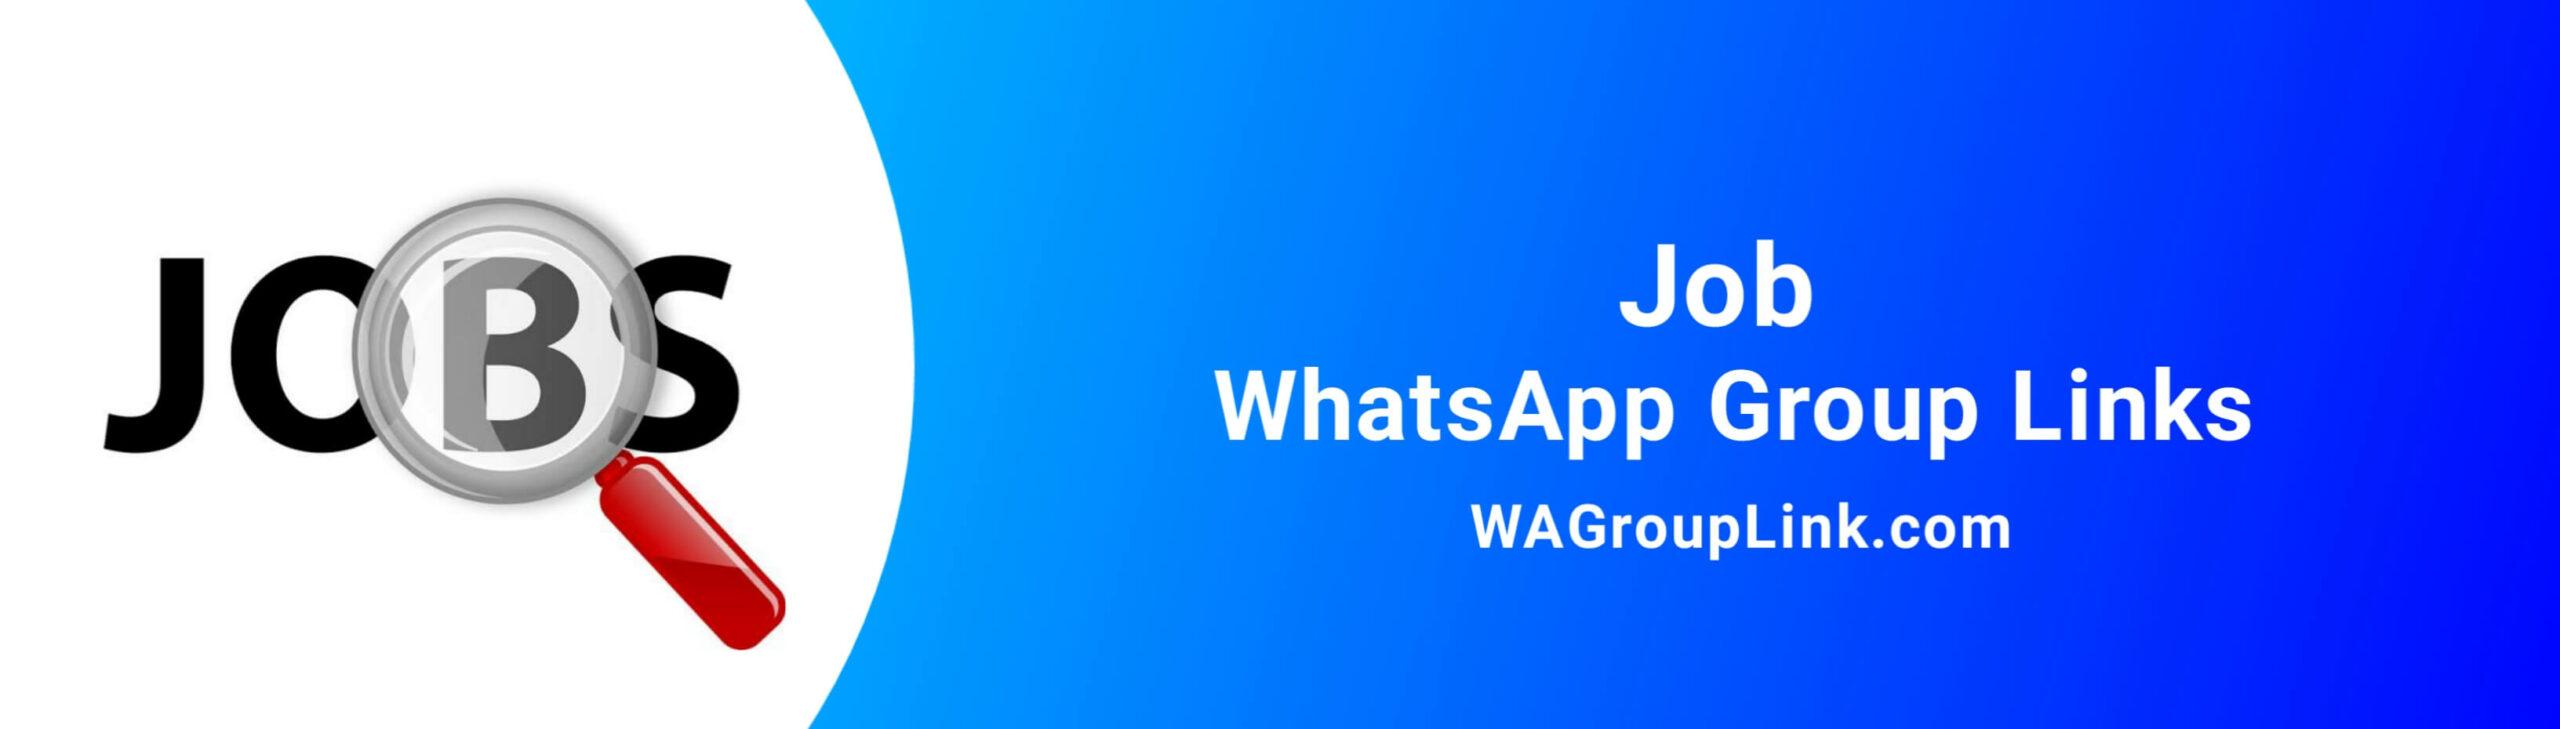 Job WhatsApp Group Links